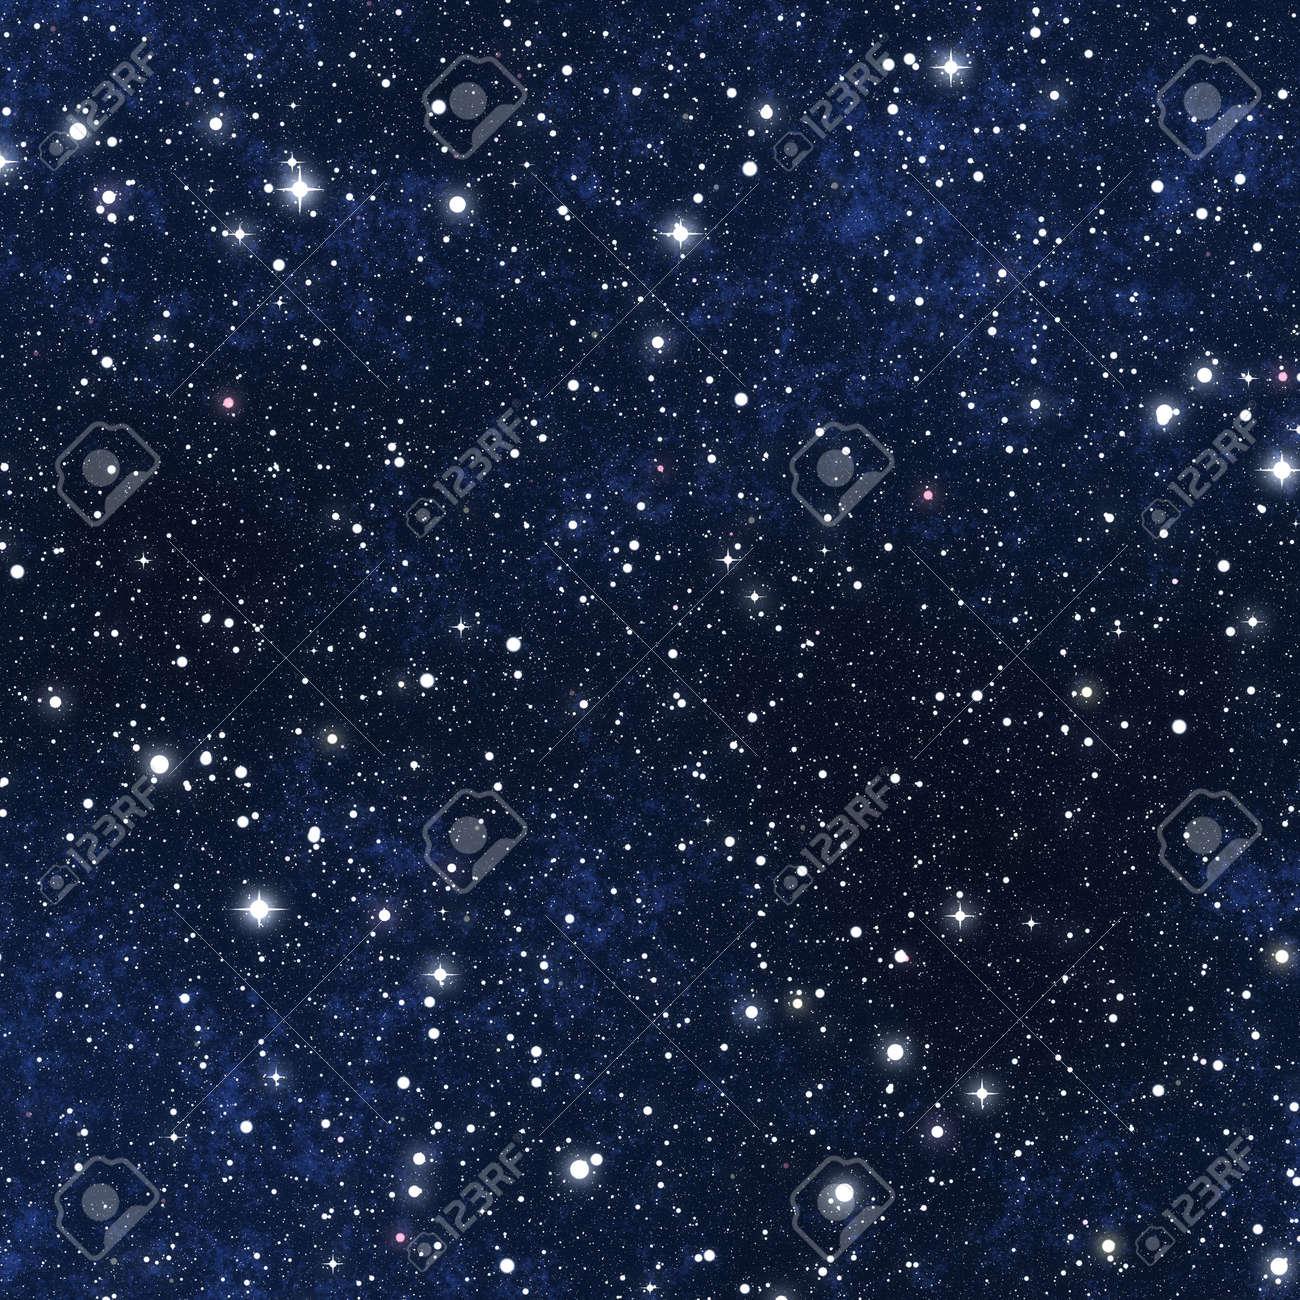 Night Sky Stars Texture a Star Filled Night Sky